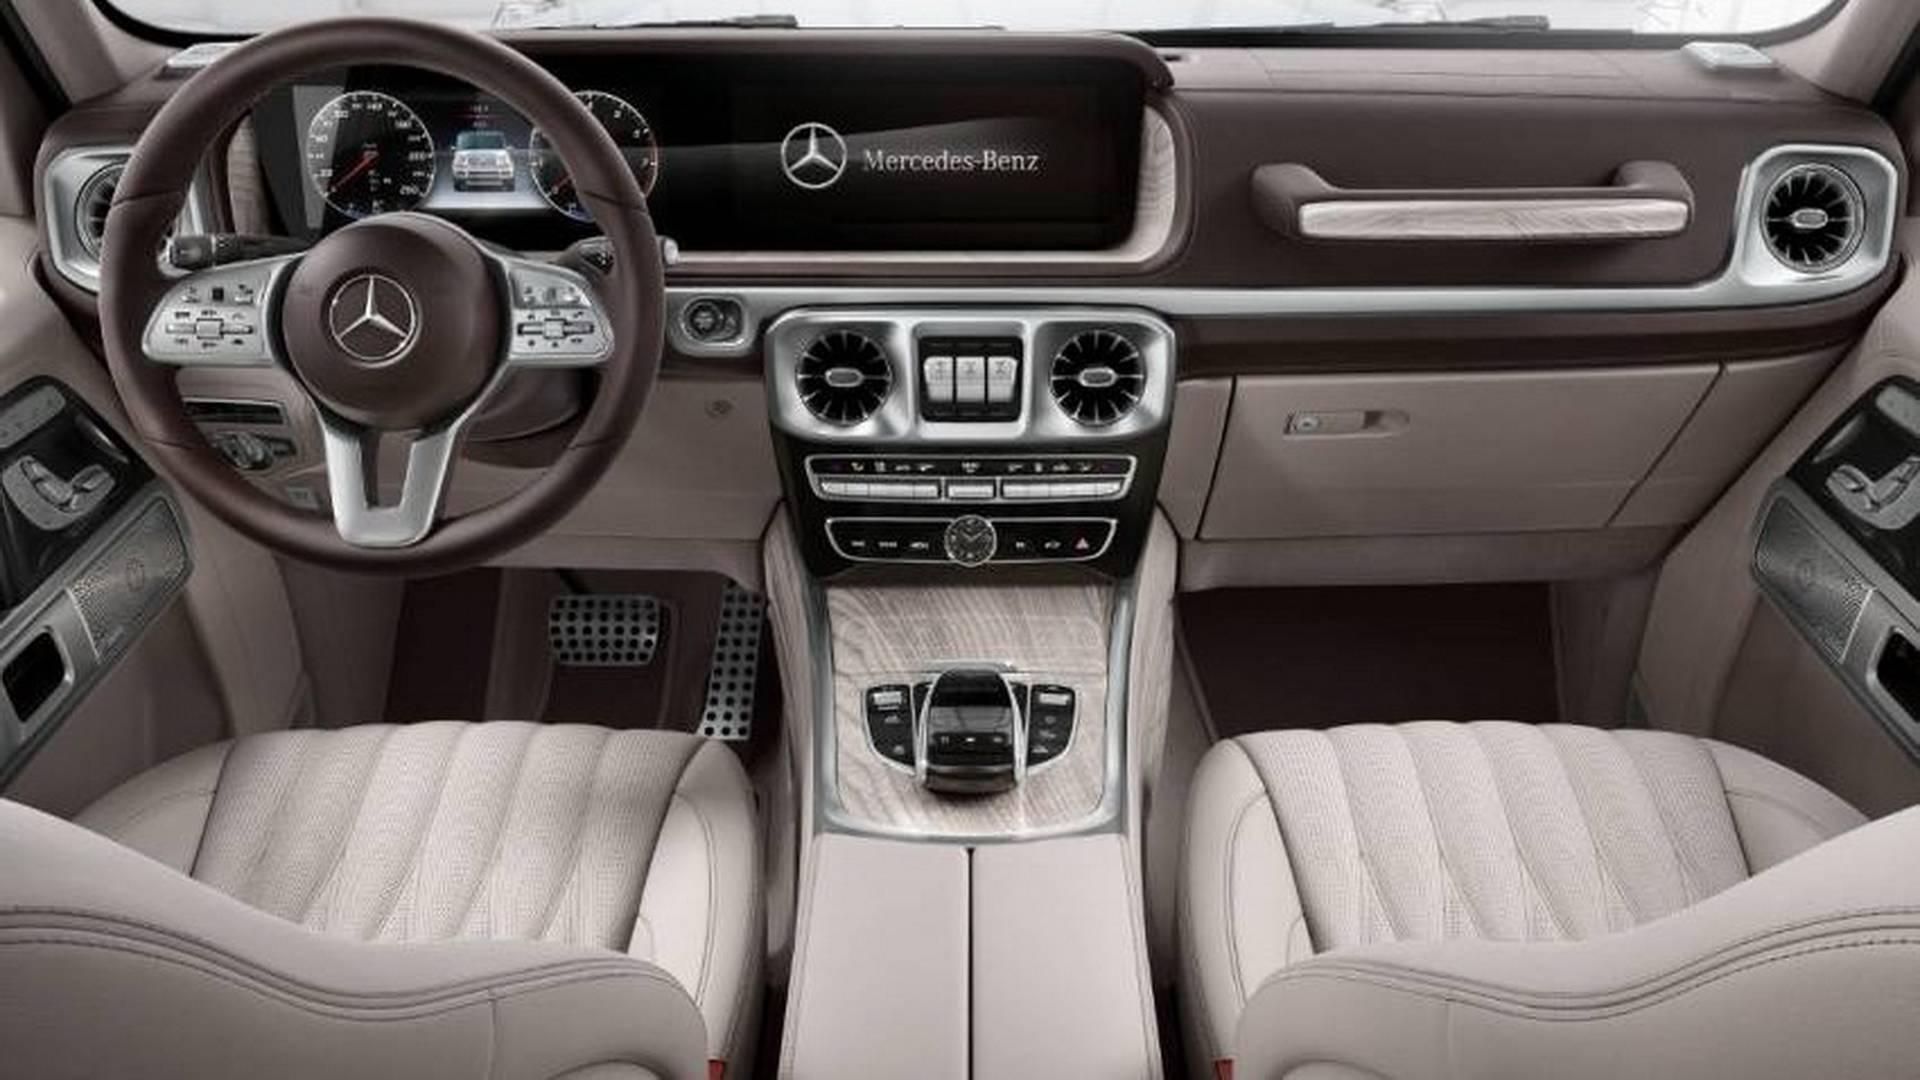 2019 Mercedes Benz G Class Interior 1 Momentogp